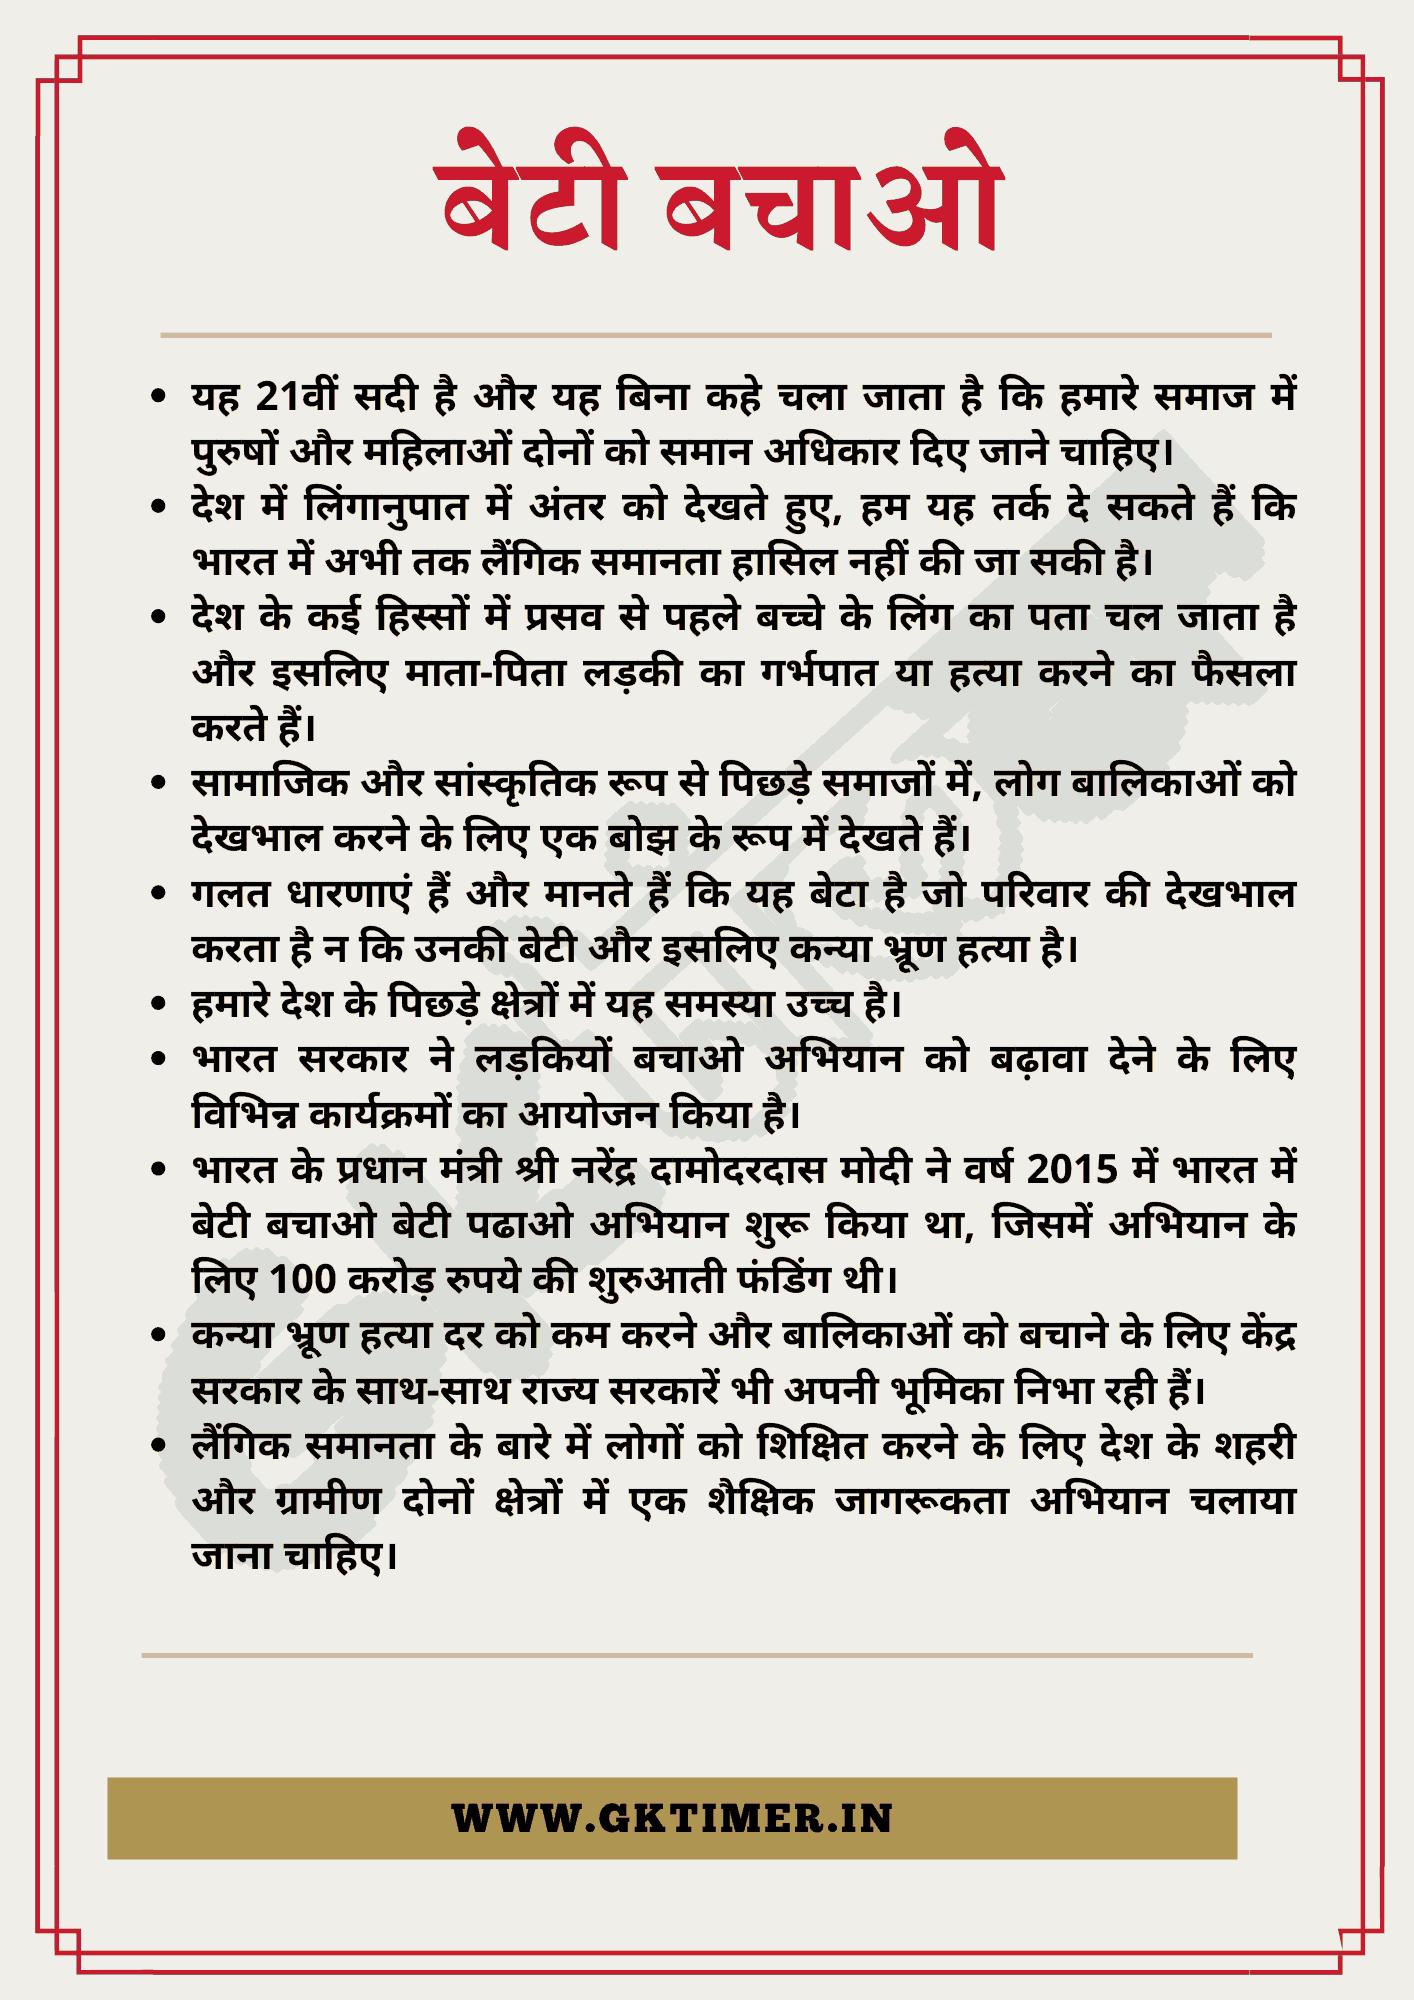 बेटी बचाओ पर निबंध | Essay on Save Girl Child in Hindi | 10 Lines on Save Girl Child in Hindi